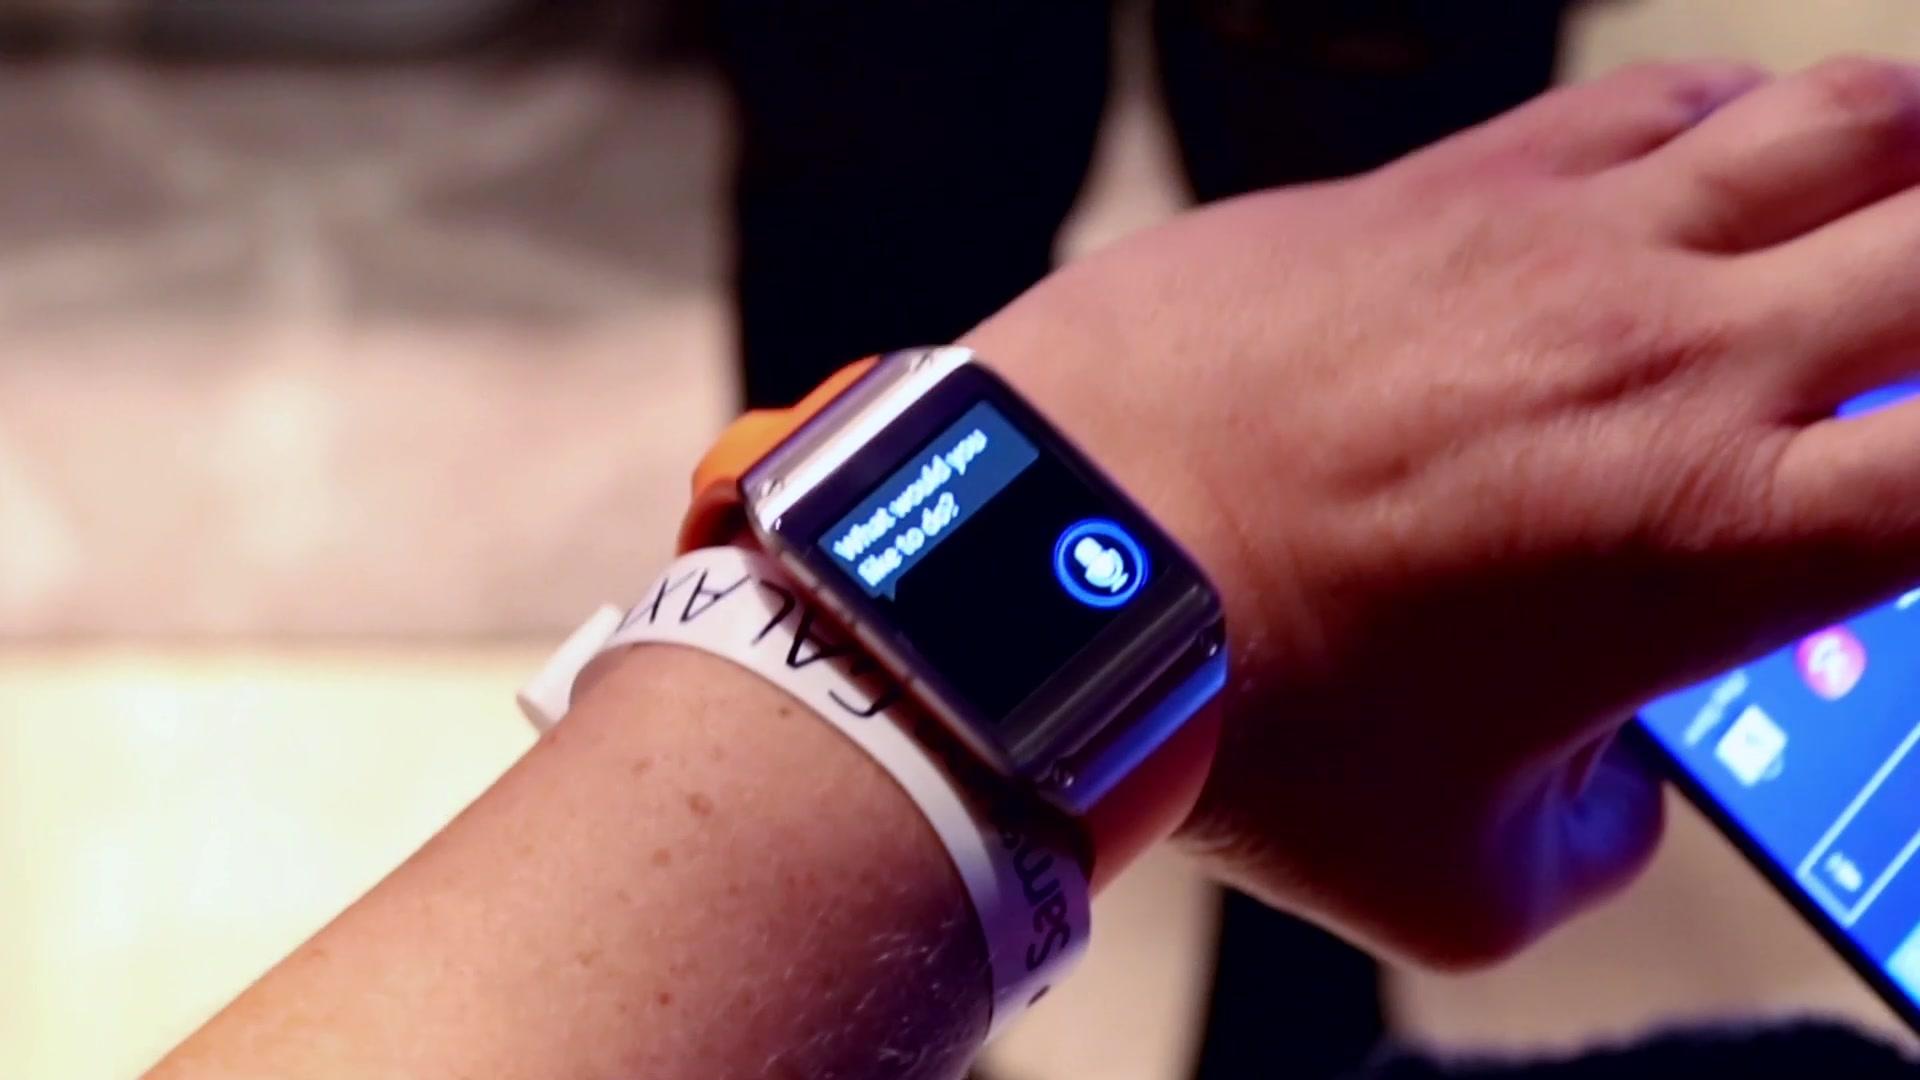 First Look at Samsung Galaxy Gear